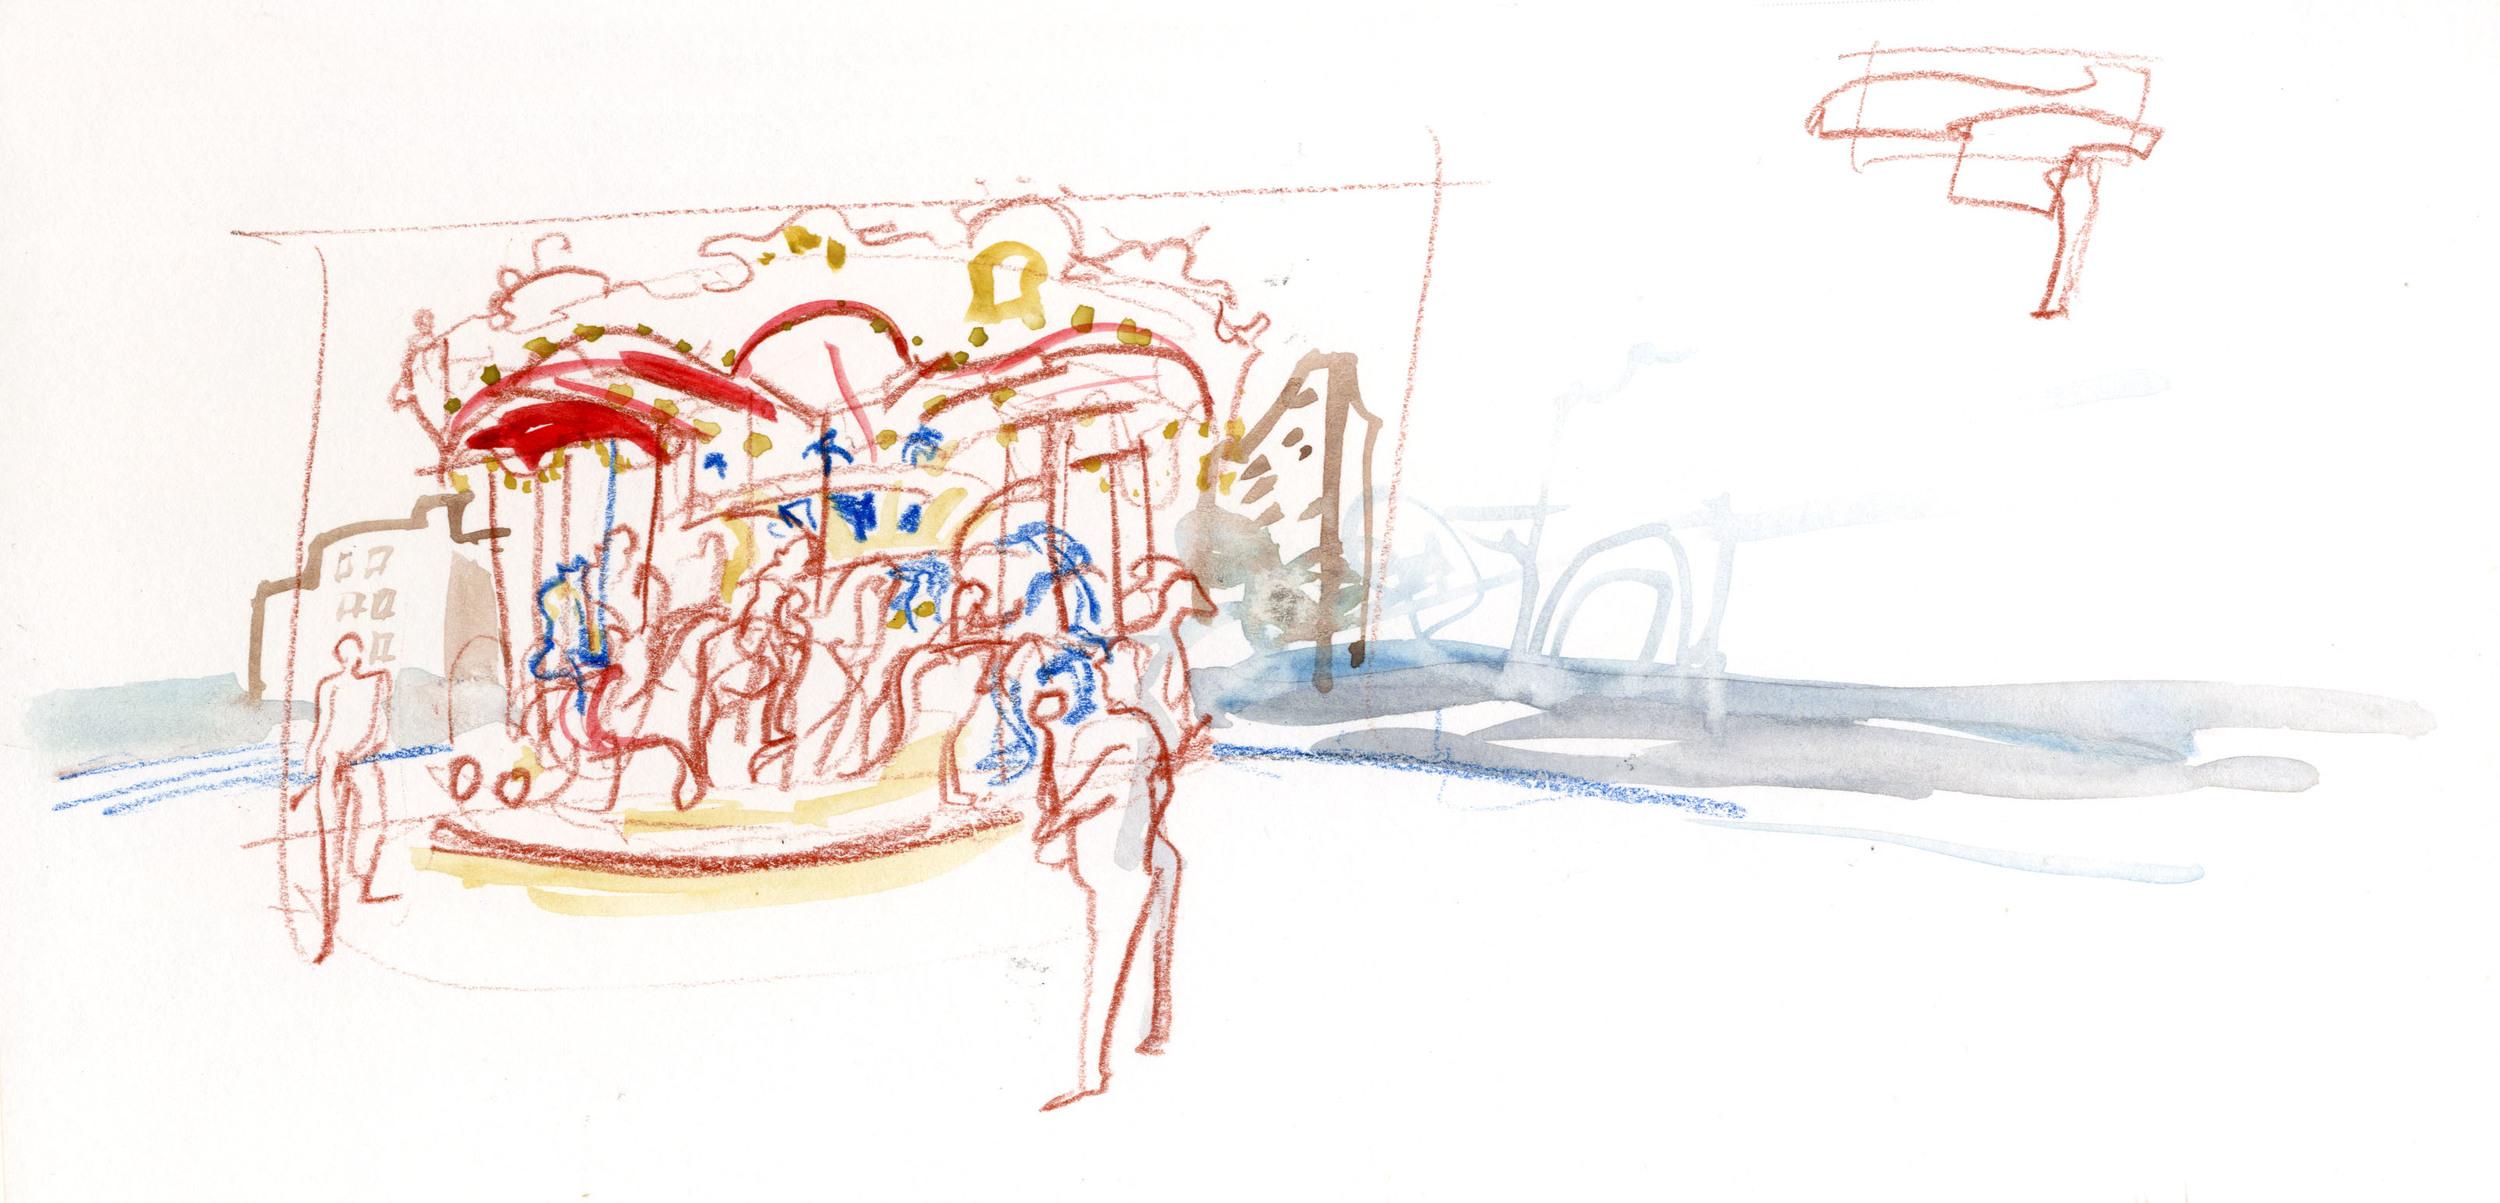 Jane's Carousel in Brooklyn Bridge Park. © Carly Larsson 2014.